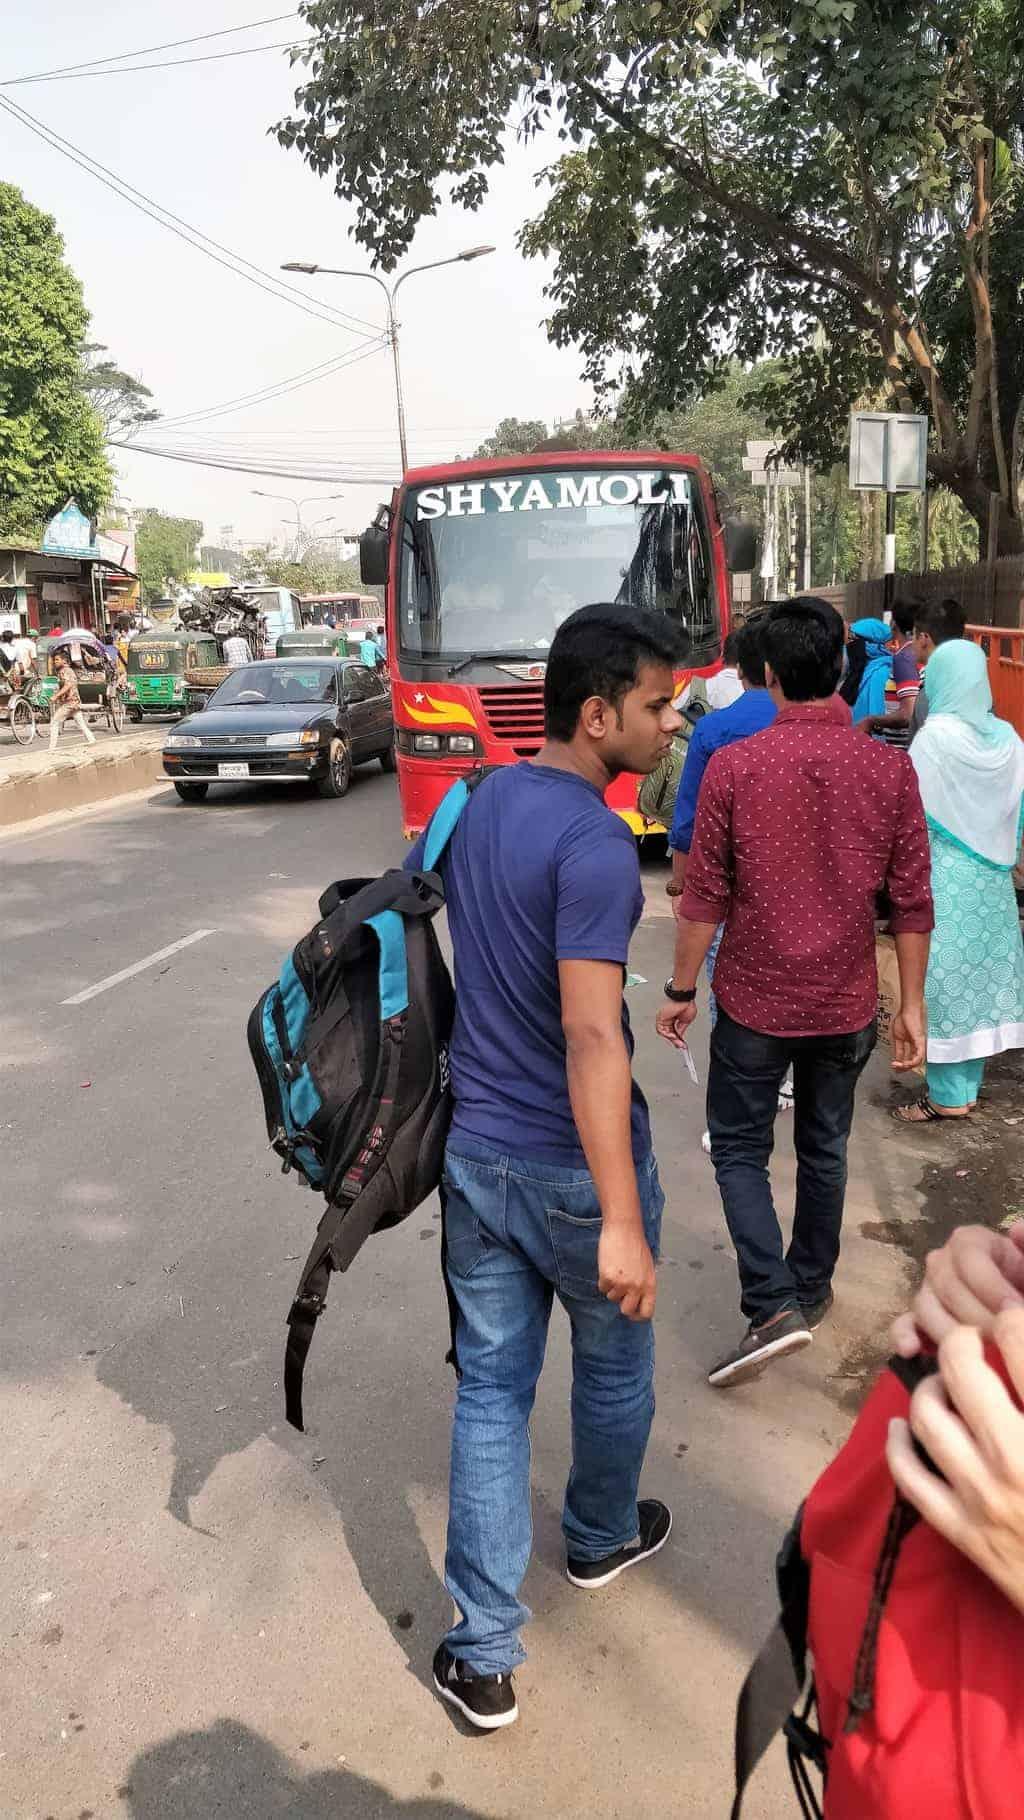 shyamoli bus from dhaka to Sylhet